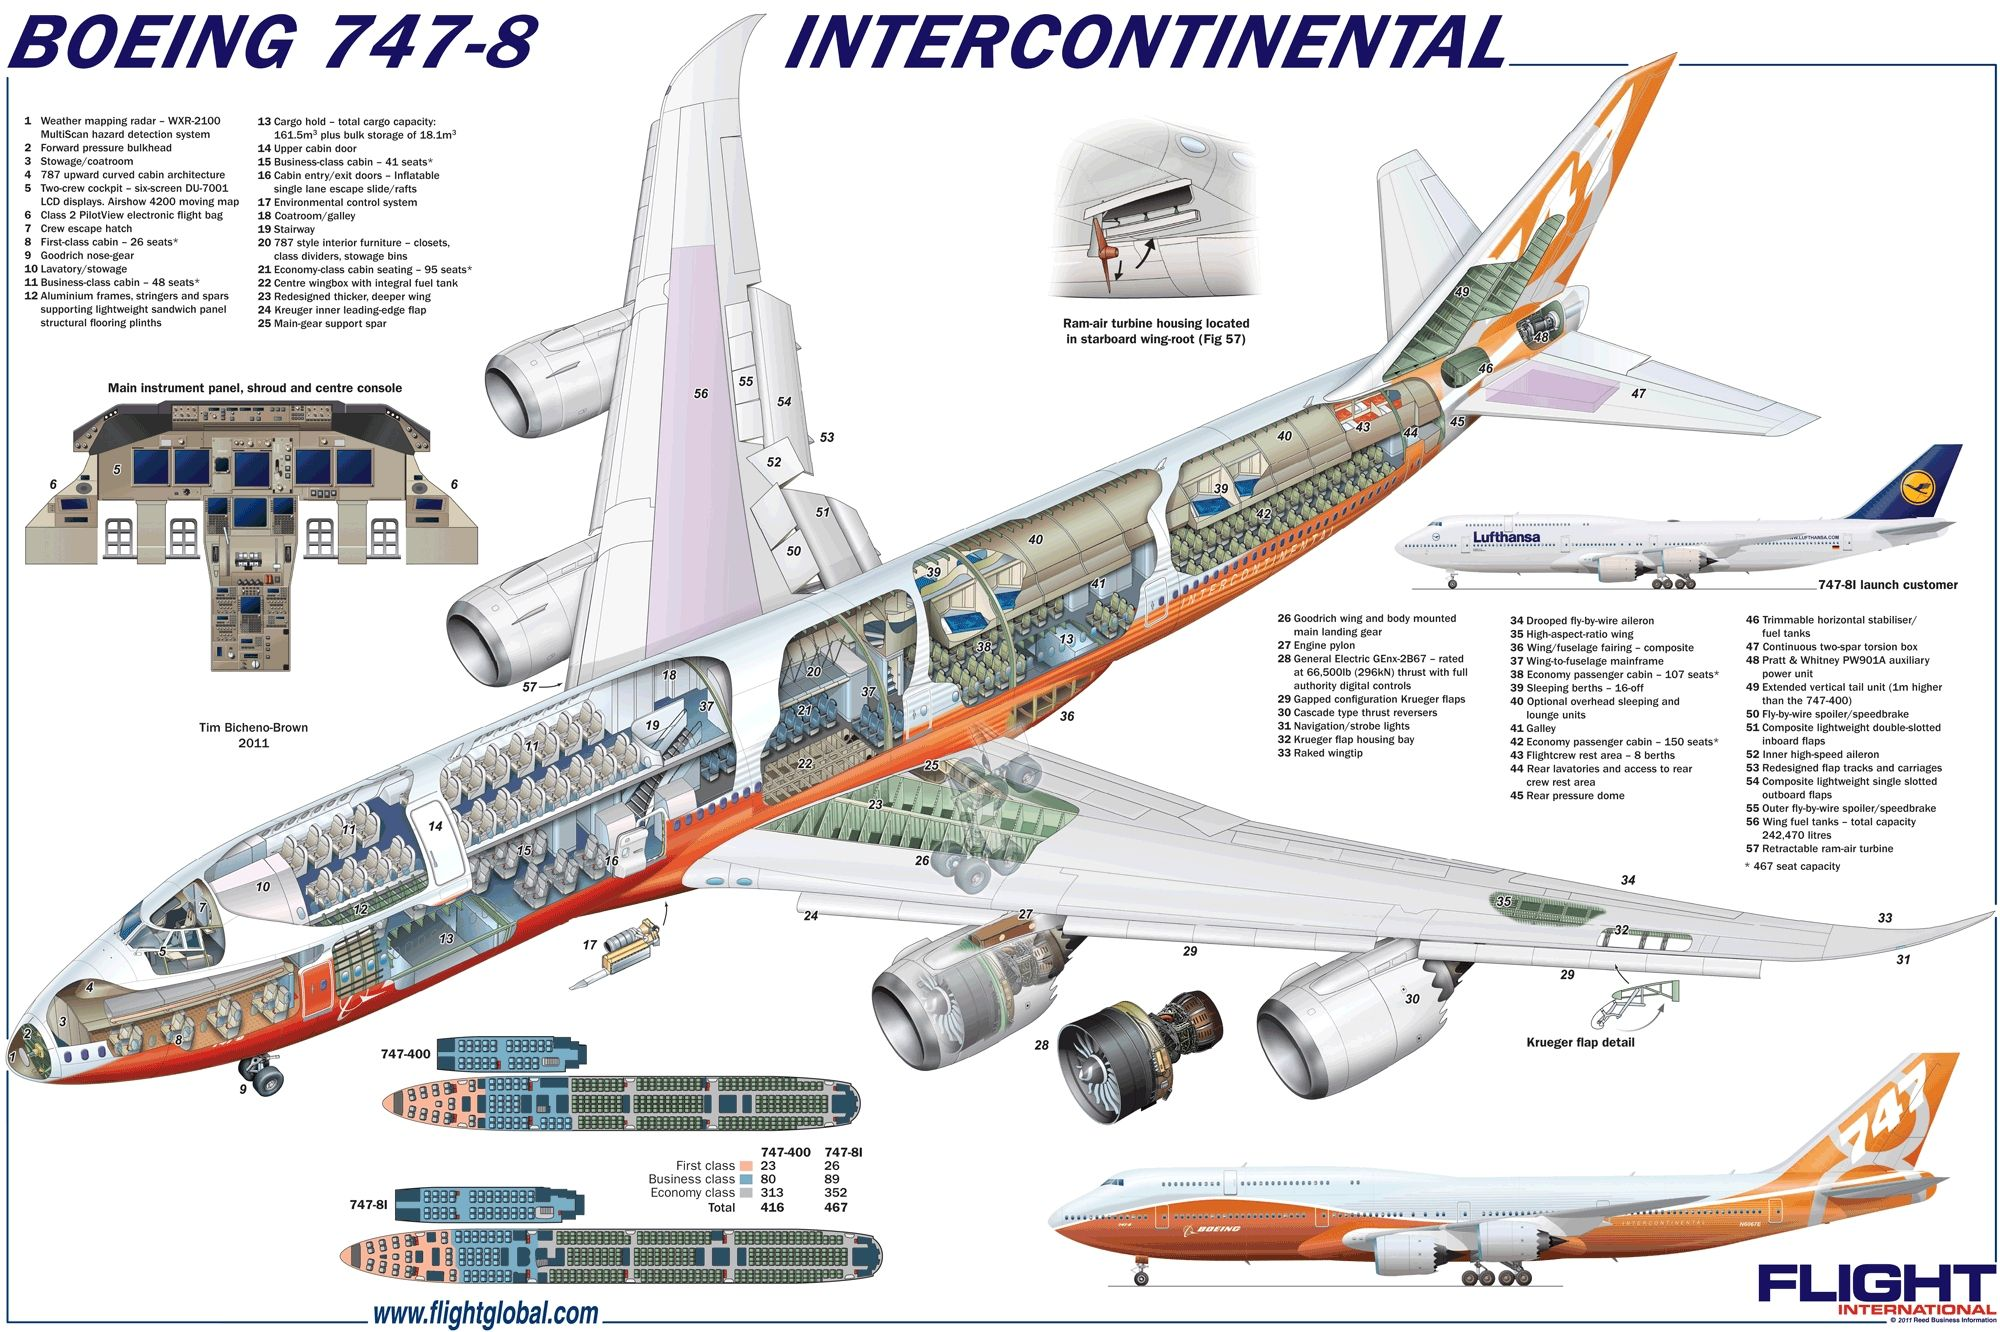 medium resolution of boeing 747 8 intercontinental cutaway diagram